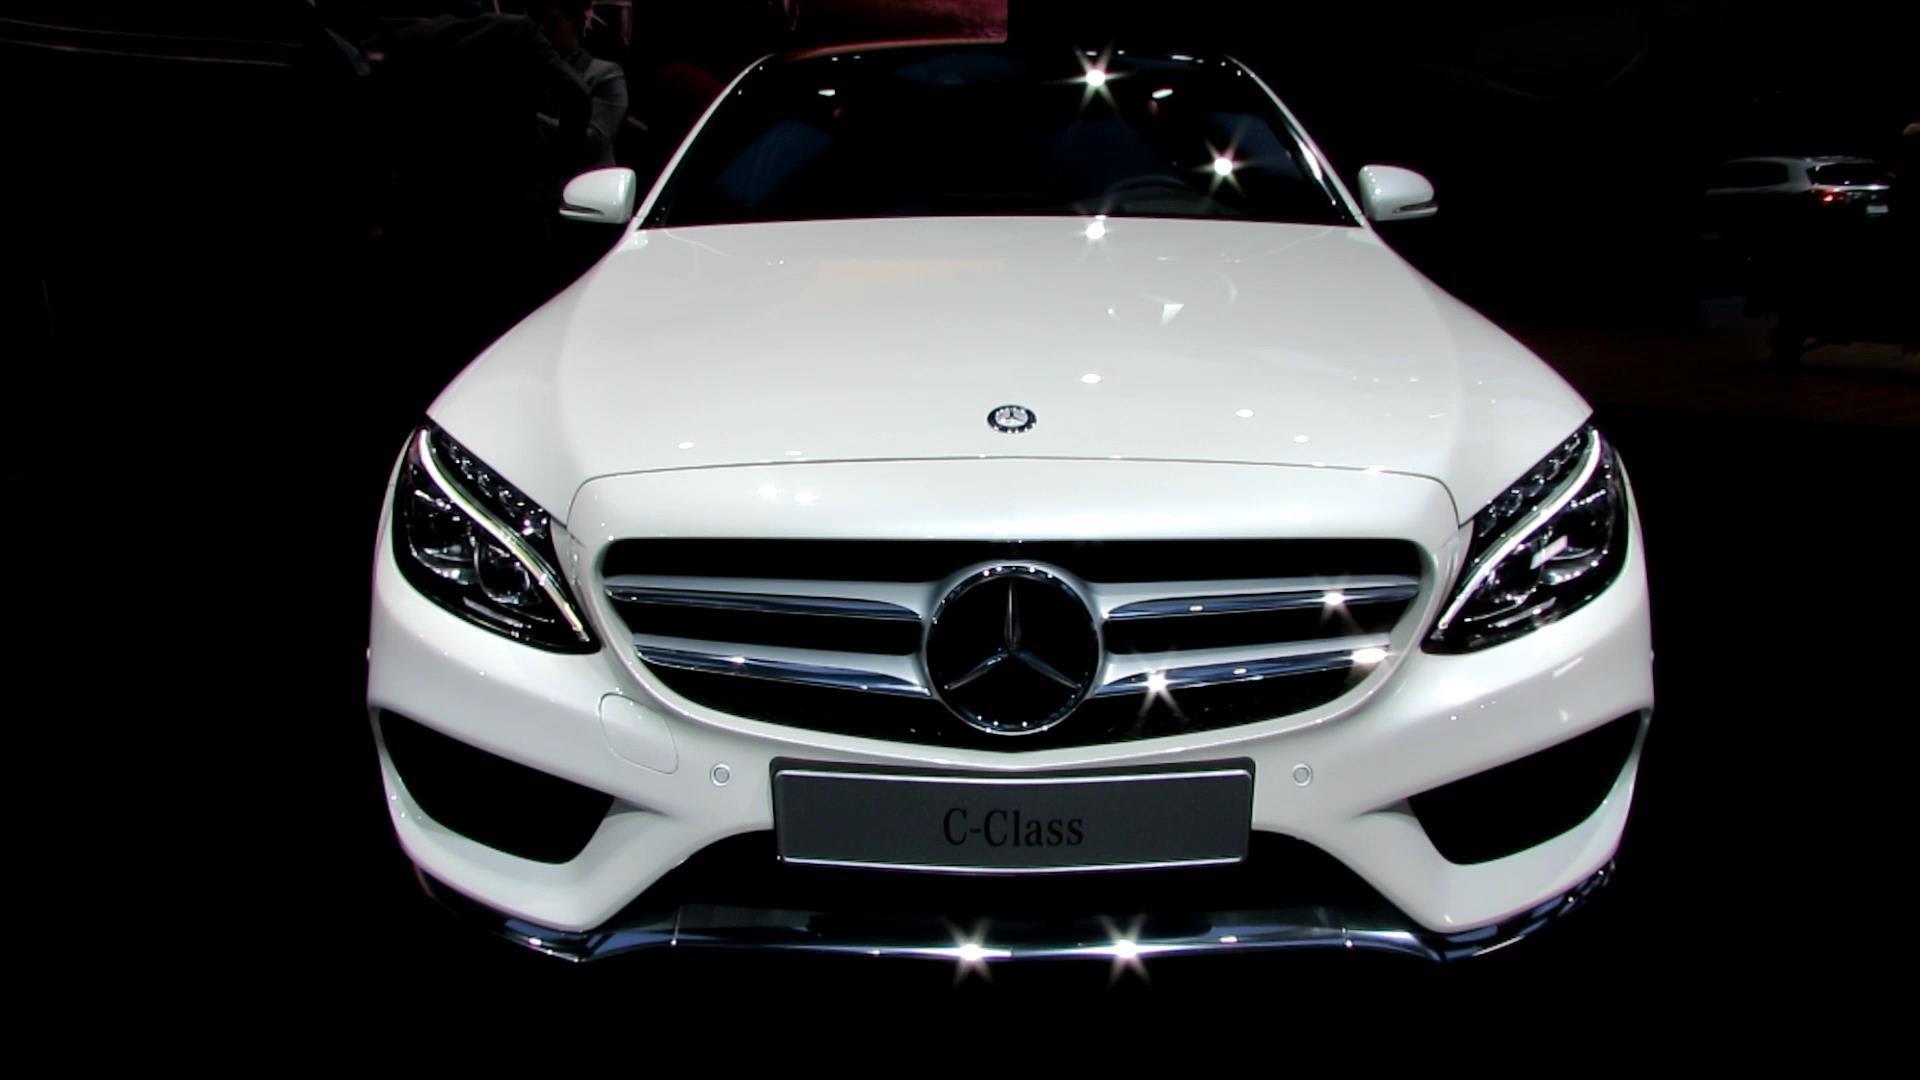 Mercedes-Benz C-klasse IV (W205) 2014 - now Sedan #1